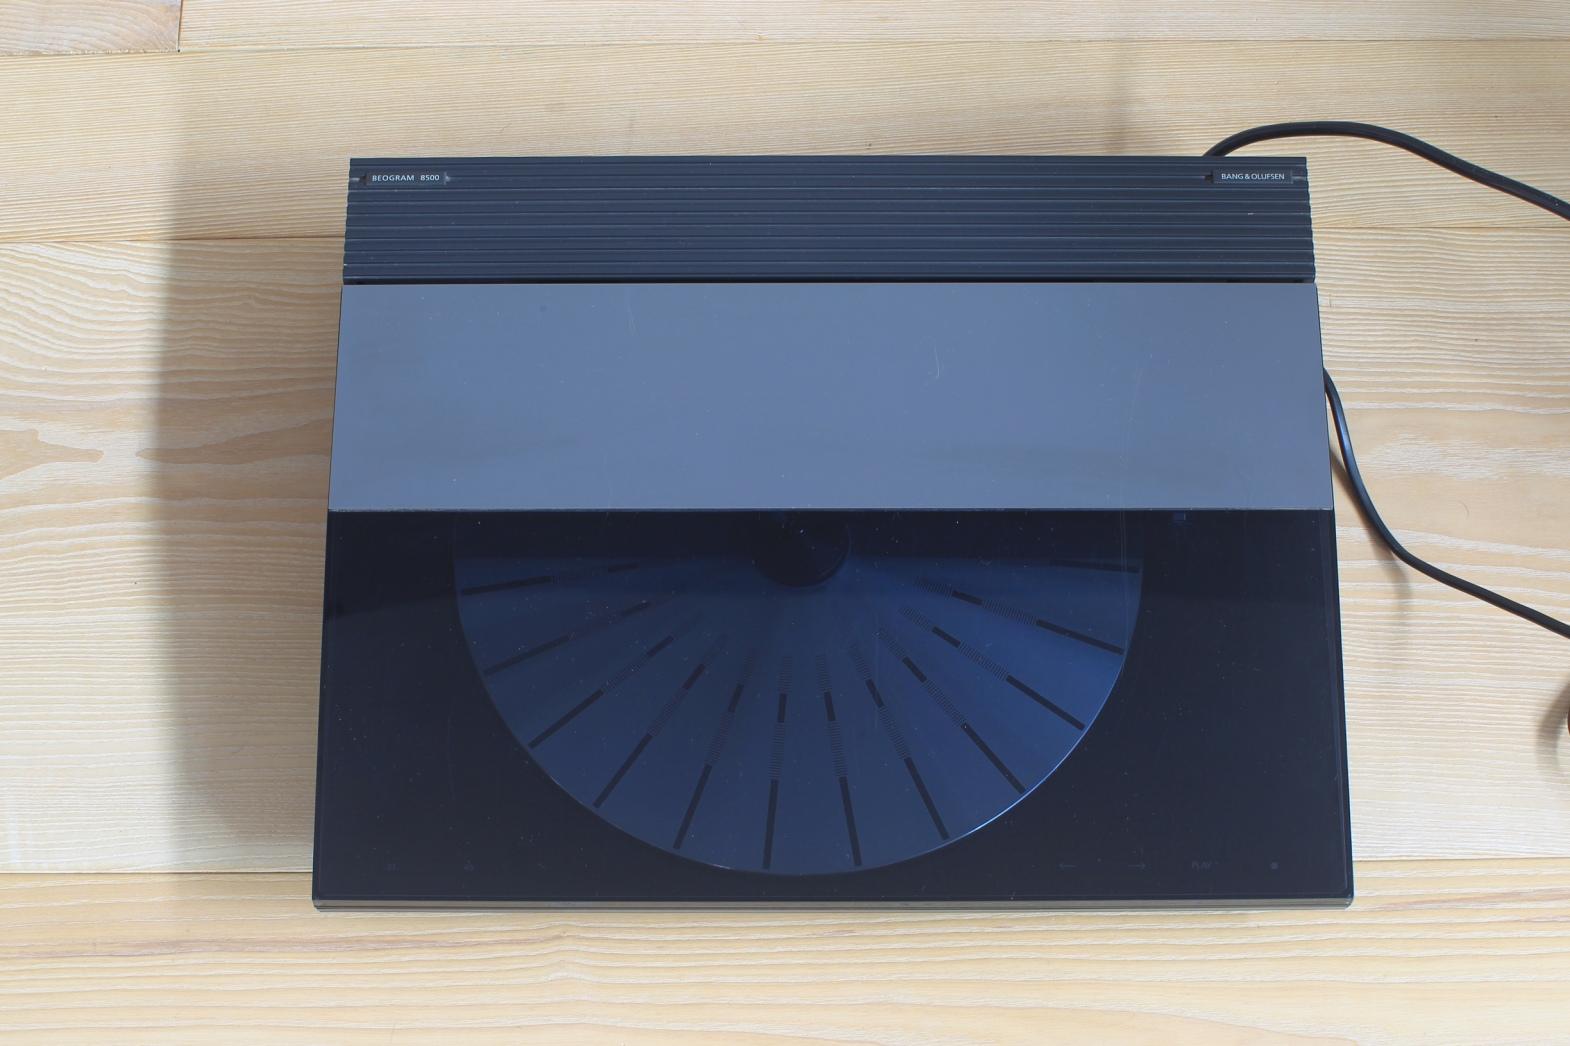 B&O 8500-6